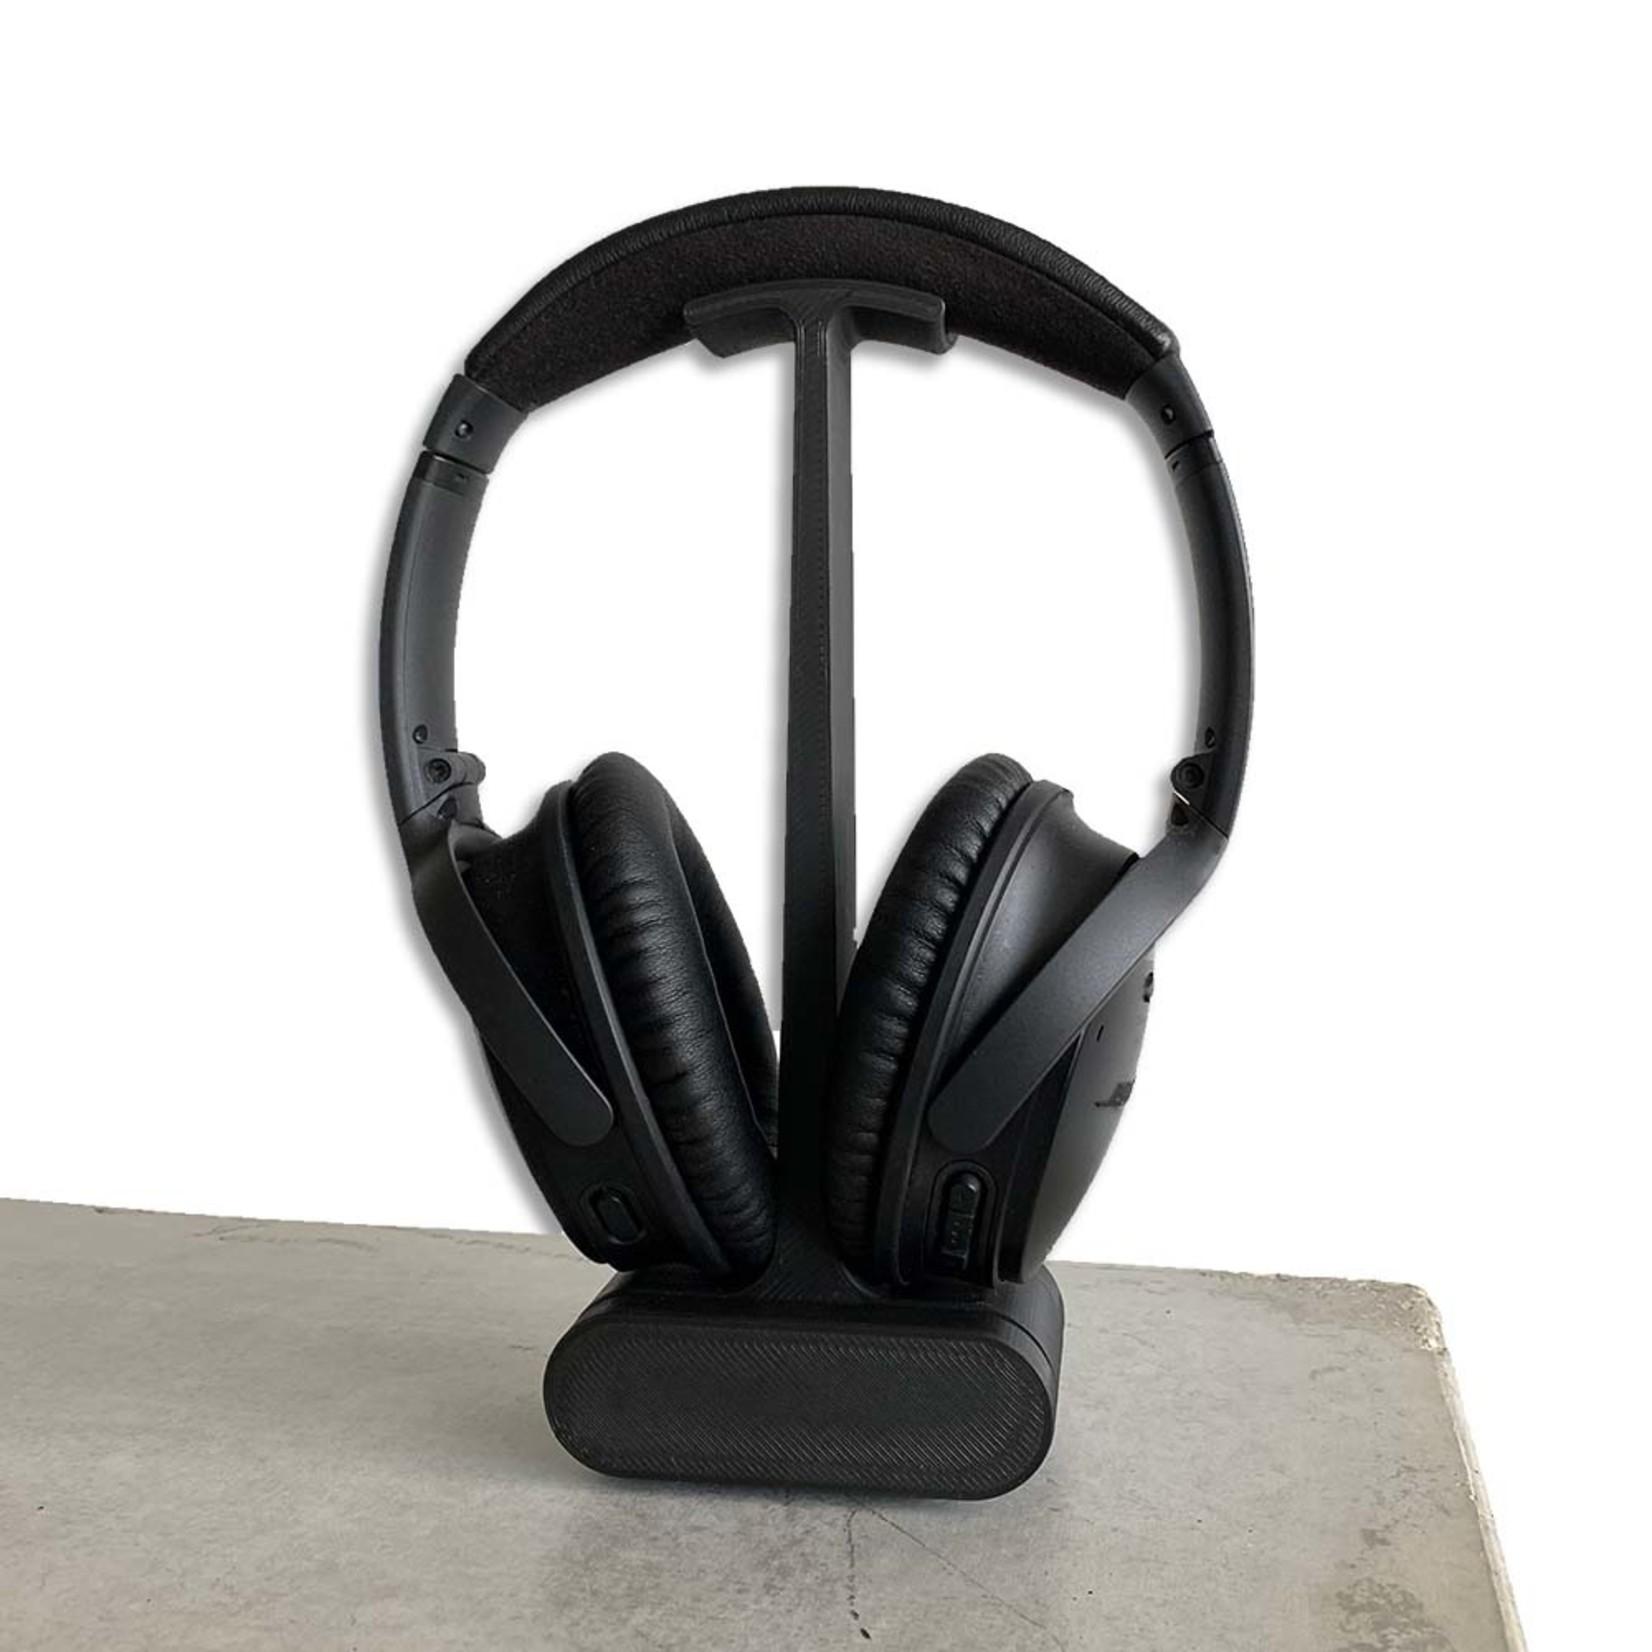 Umake Headphone stand | Stores and displays your headphone